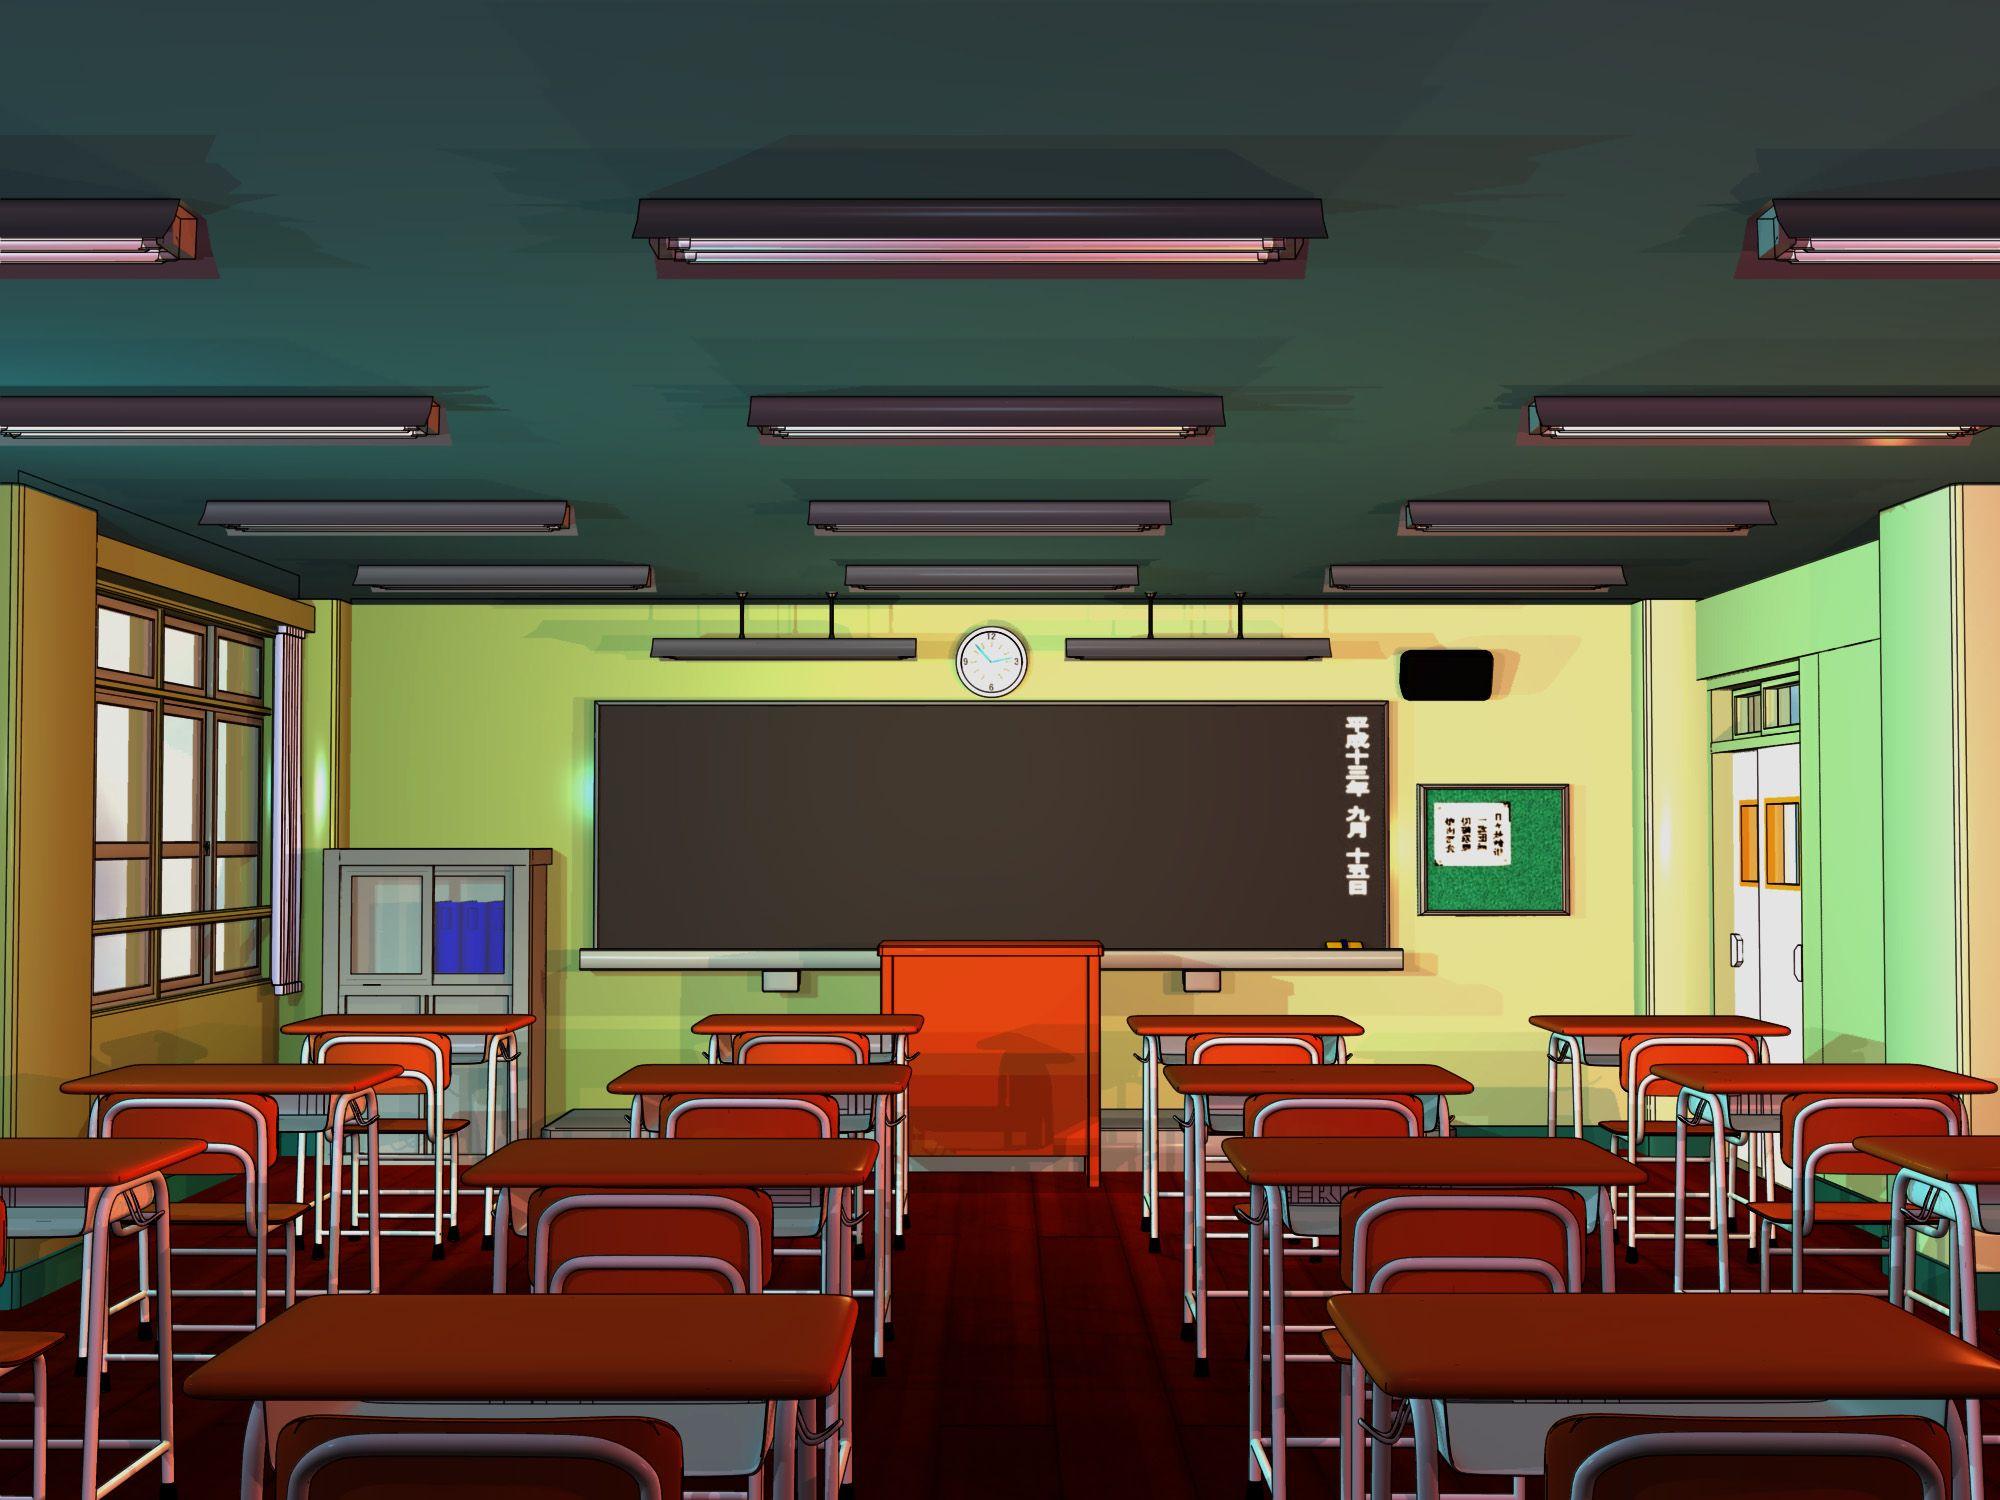 Anime Background Classroom by FireSnake666.deviantart